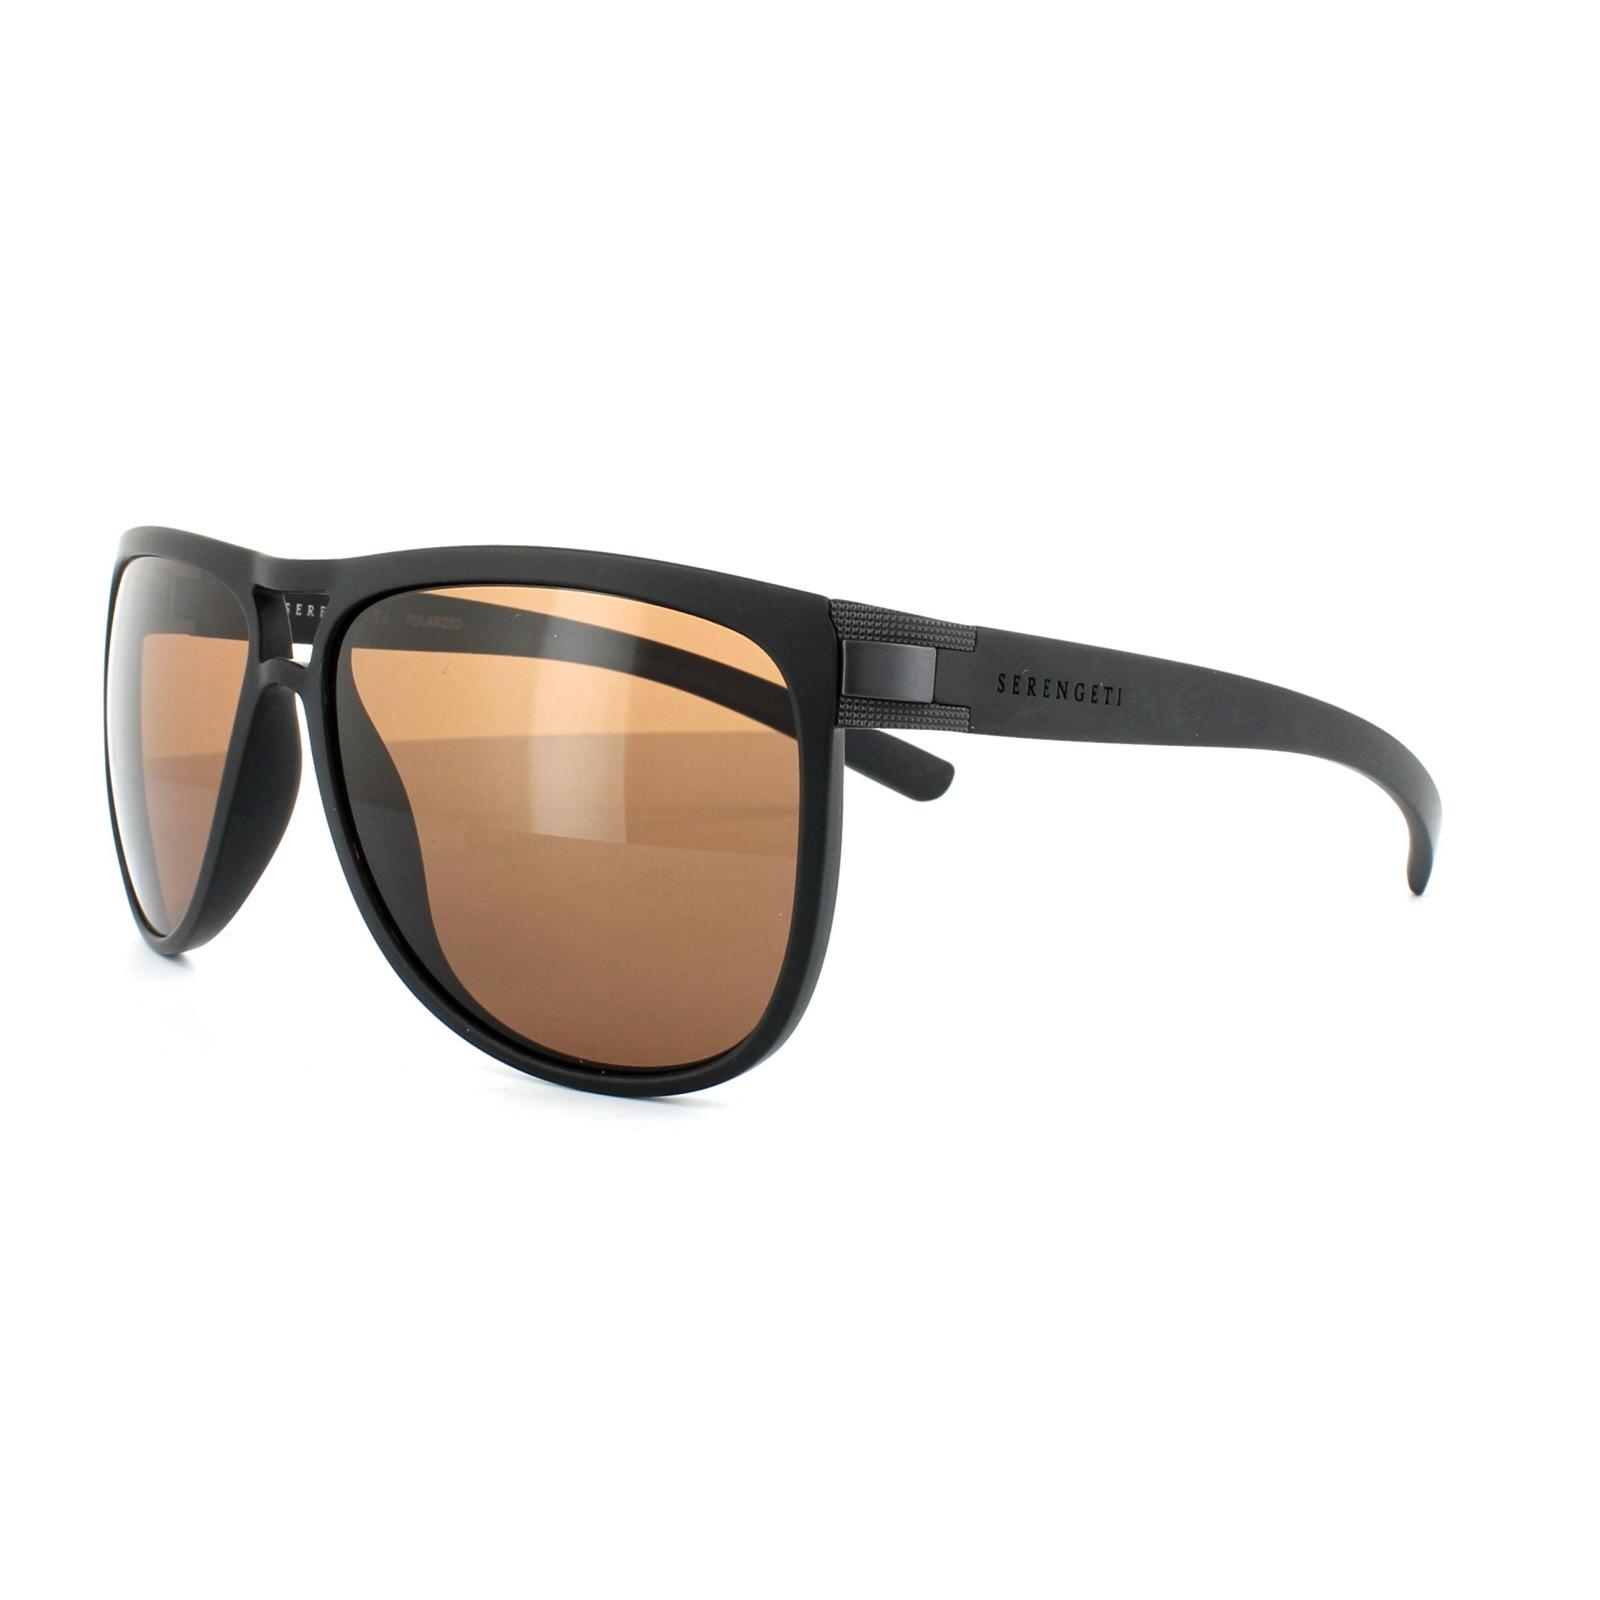 89577070e9 CENTINELA Serengeti gafas de sol Verdi 7937 marrón Arena conductores negro  polarizado